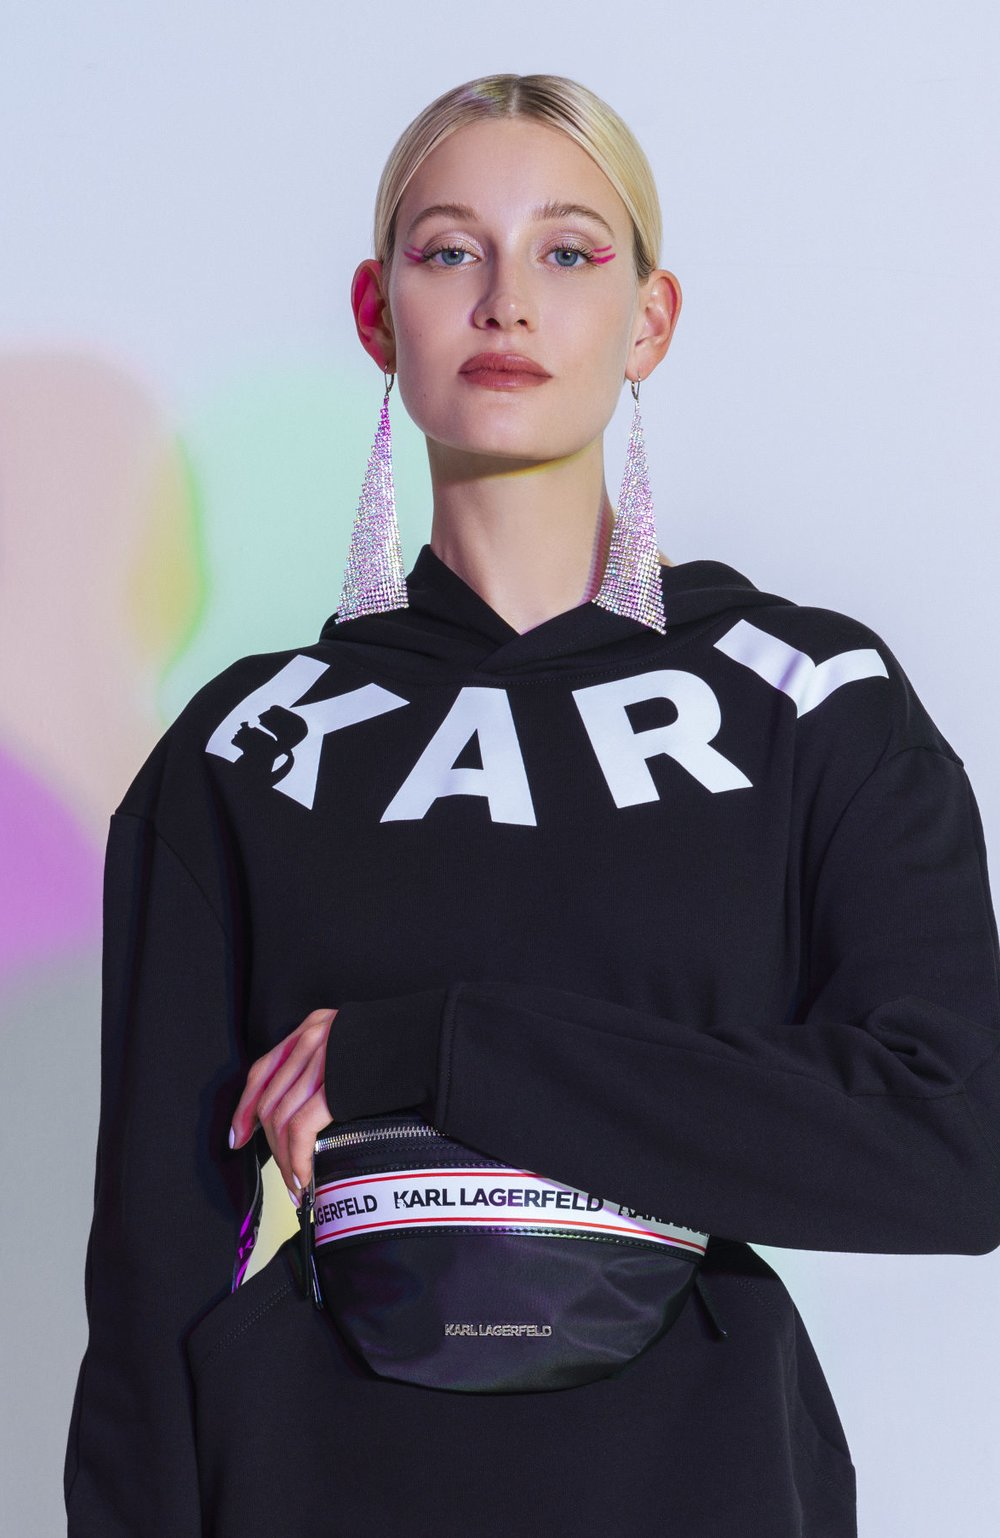 Karl Lagerfeld Zalando